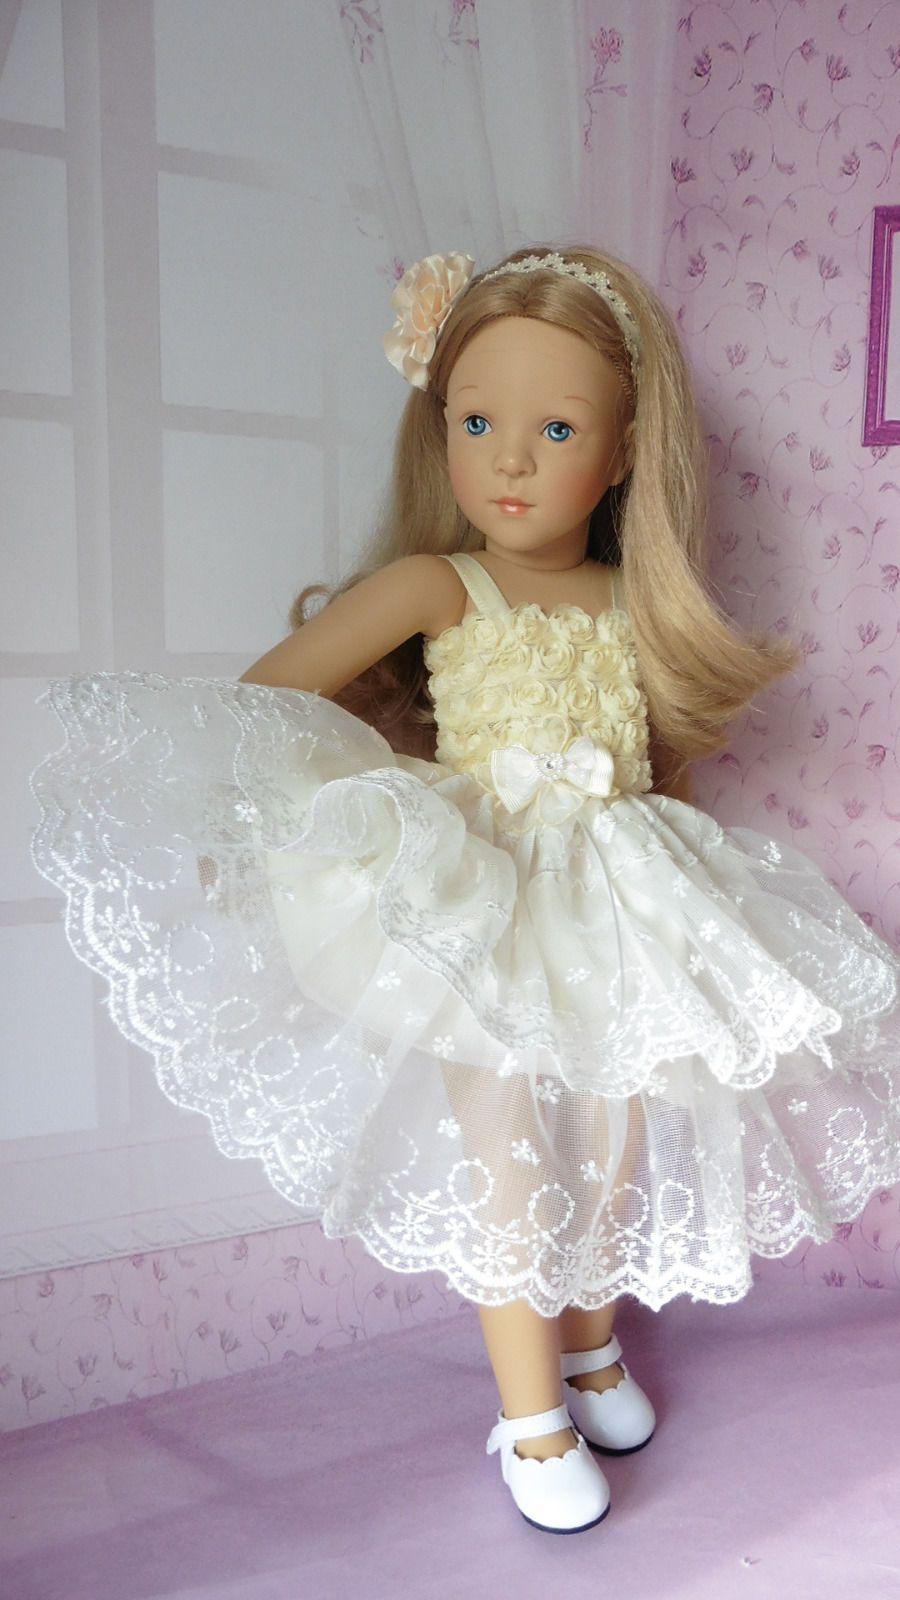 Pixies hand made:sylvia natterer finouche: petitcollin: party dress ...